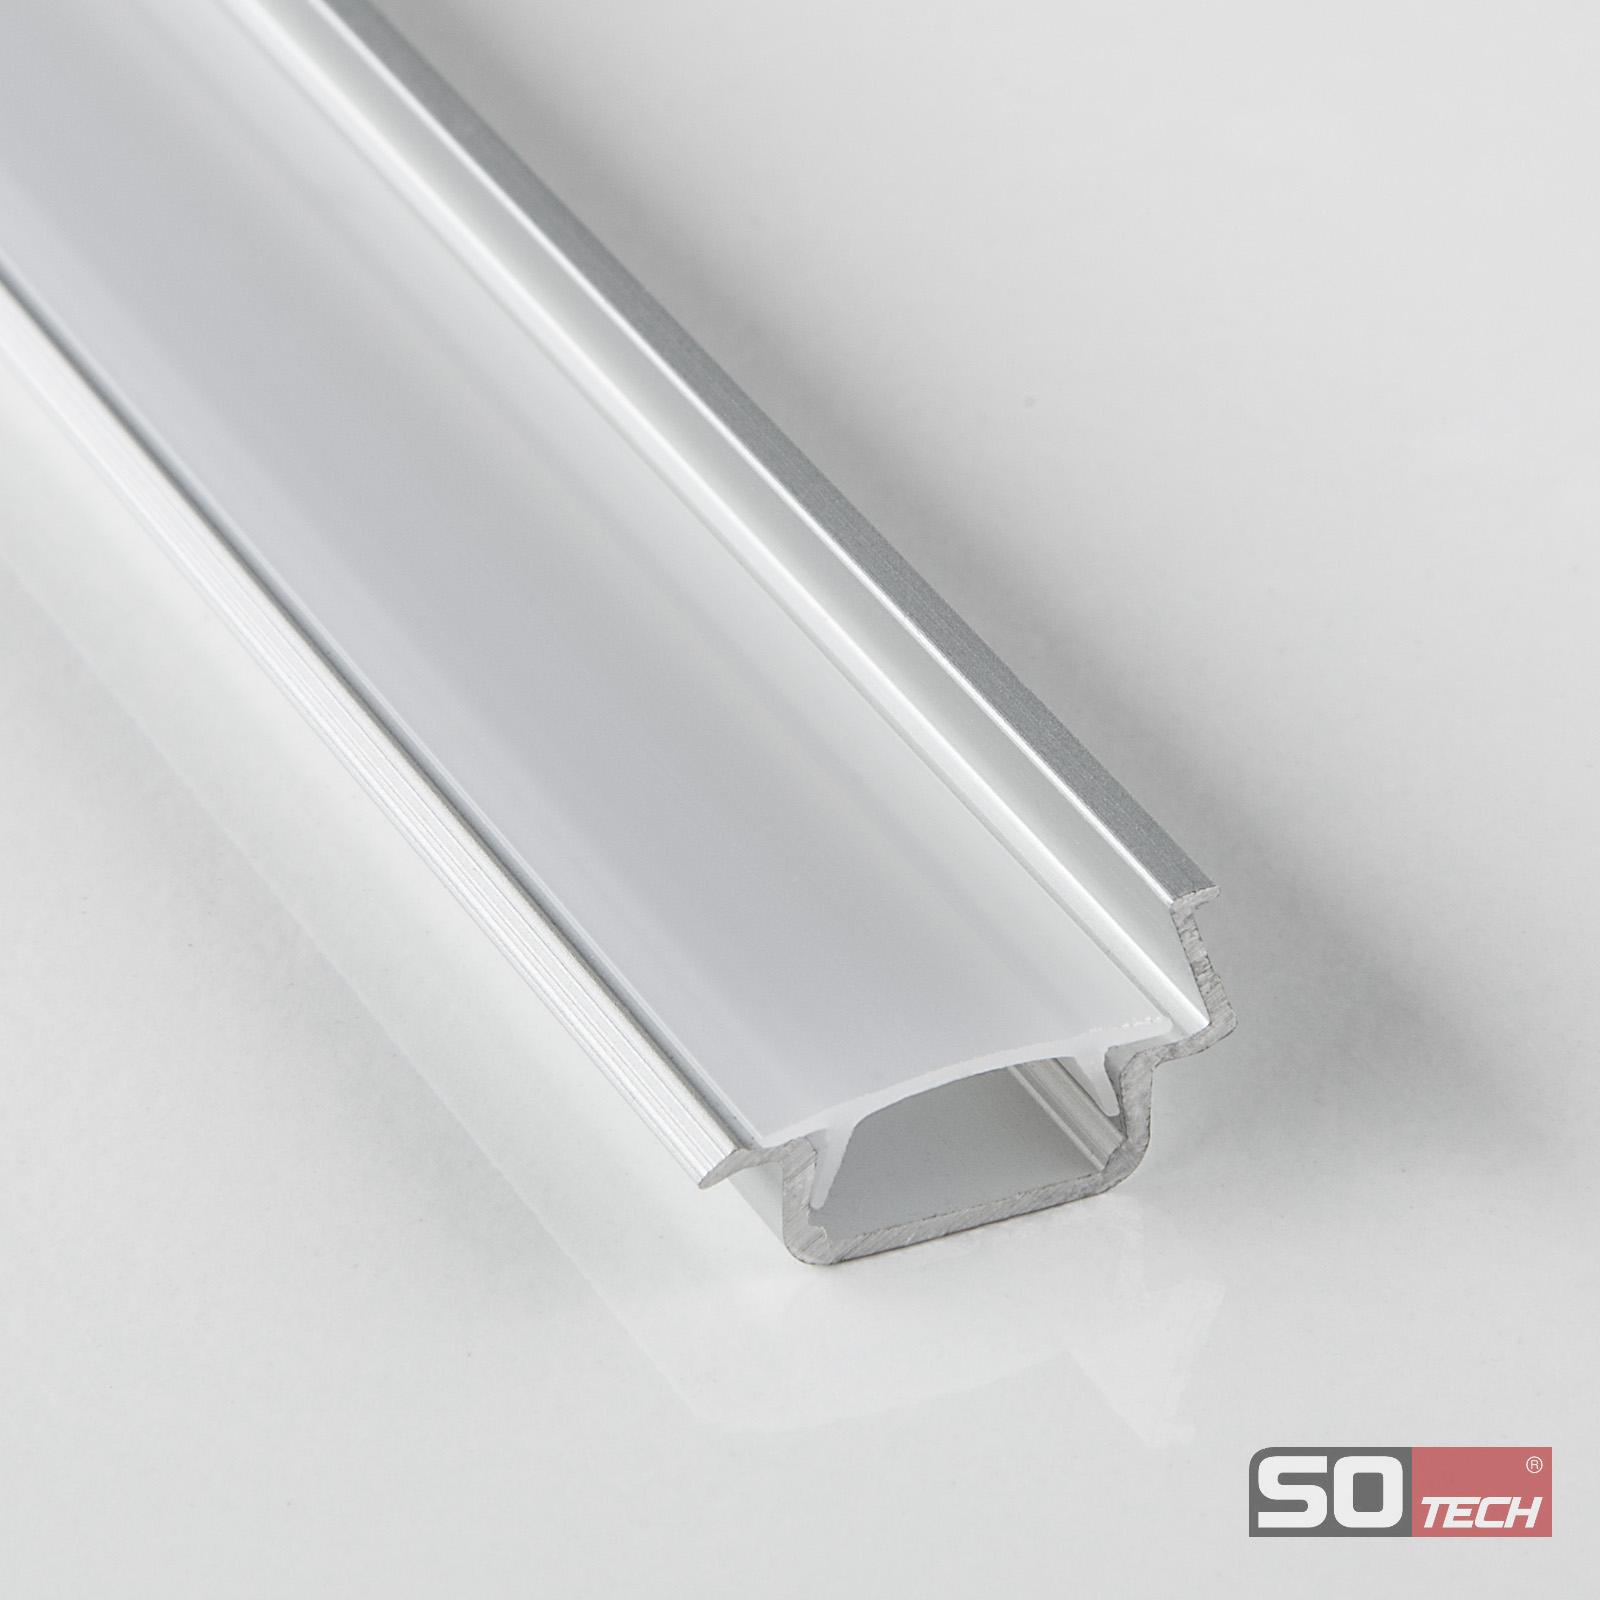 LED 30° Winkelprofil-88 opal 2 m für LED Streifen - so-handel.de